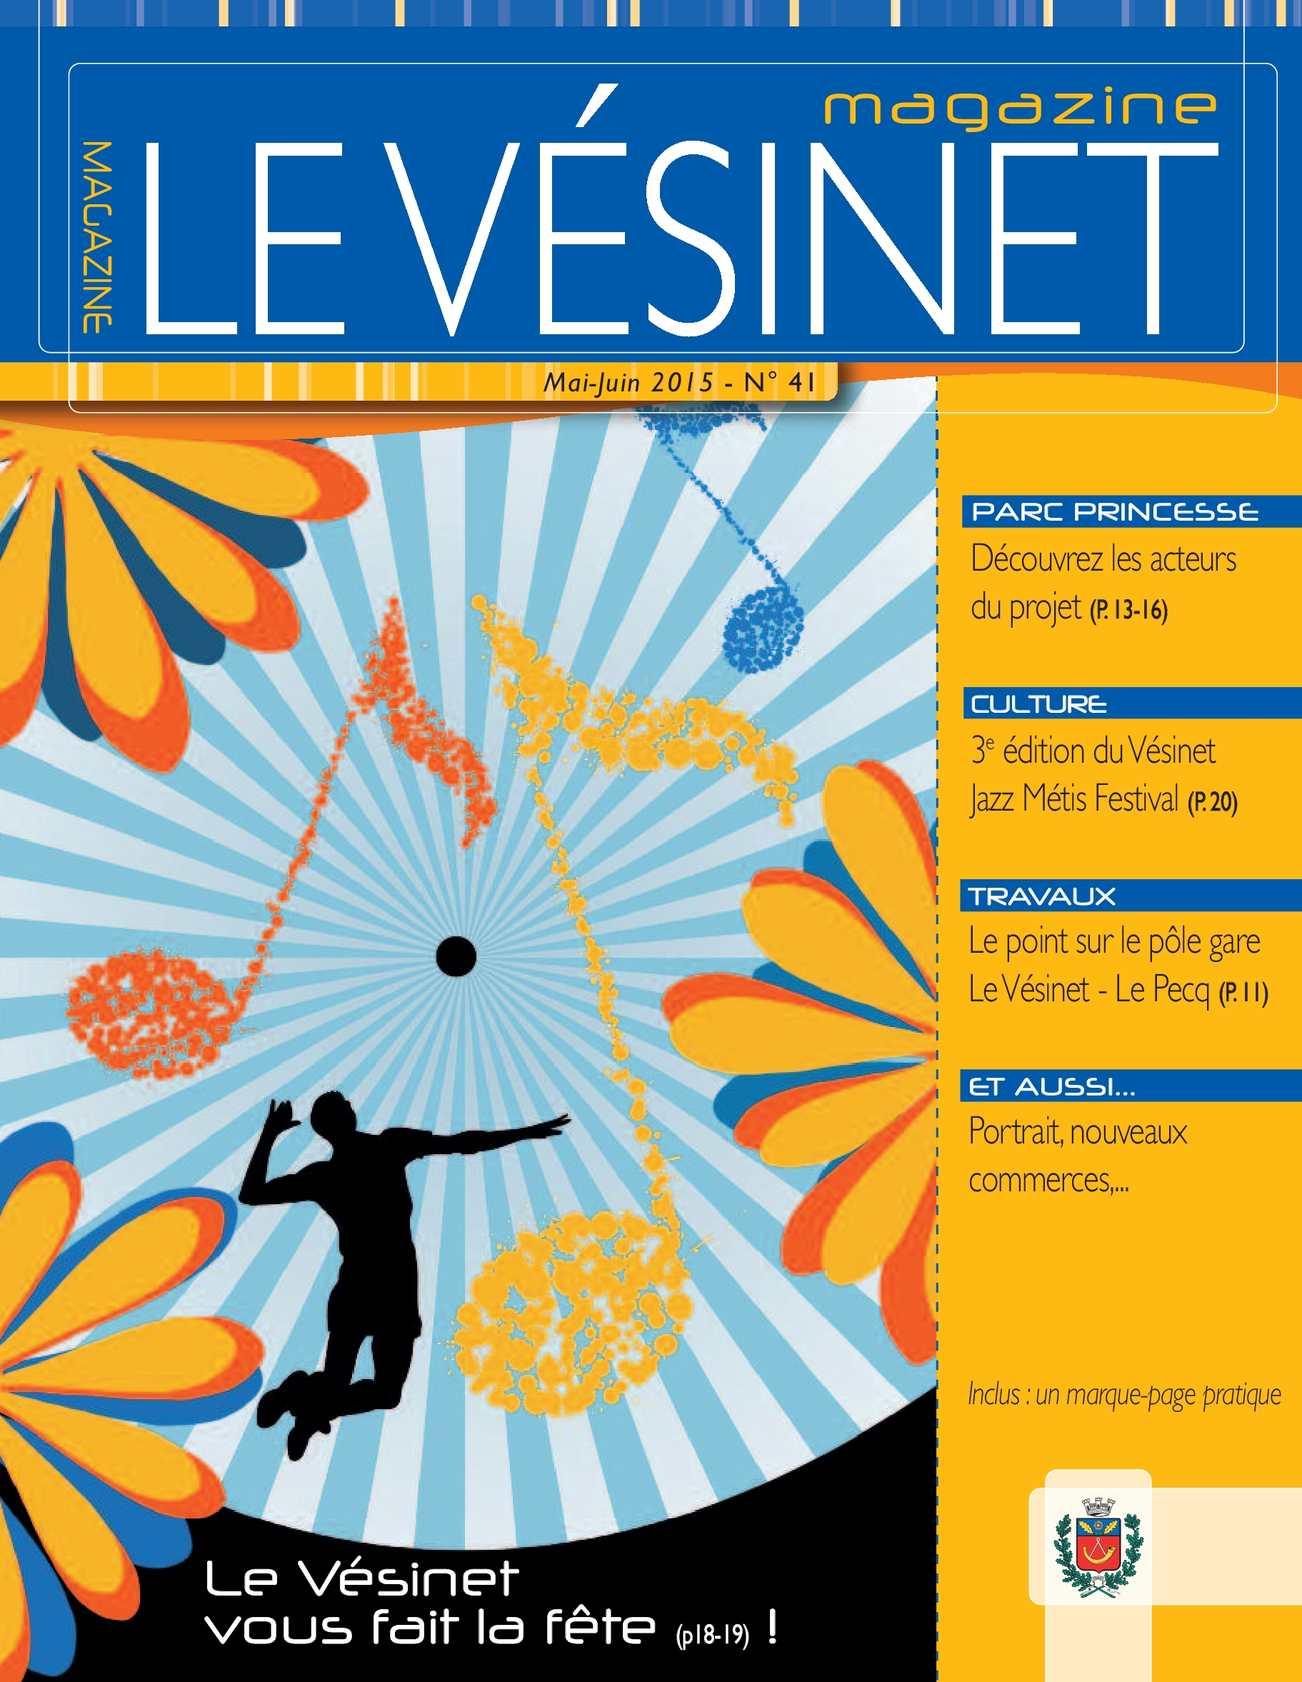 Calam o le vesinet magazine n 41 mai juin 2015 for Le divan 9 juin 2015